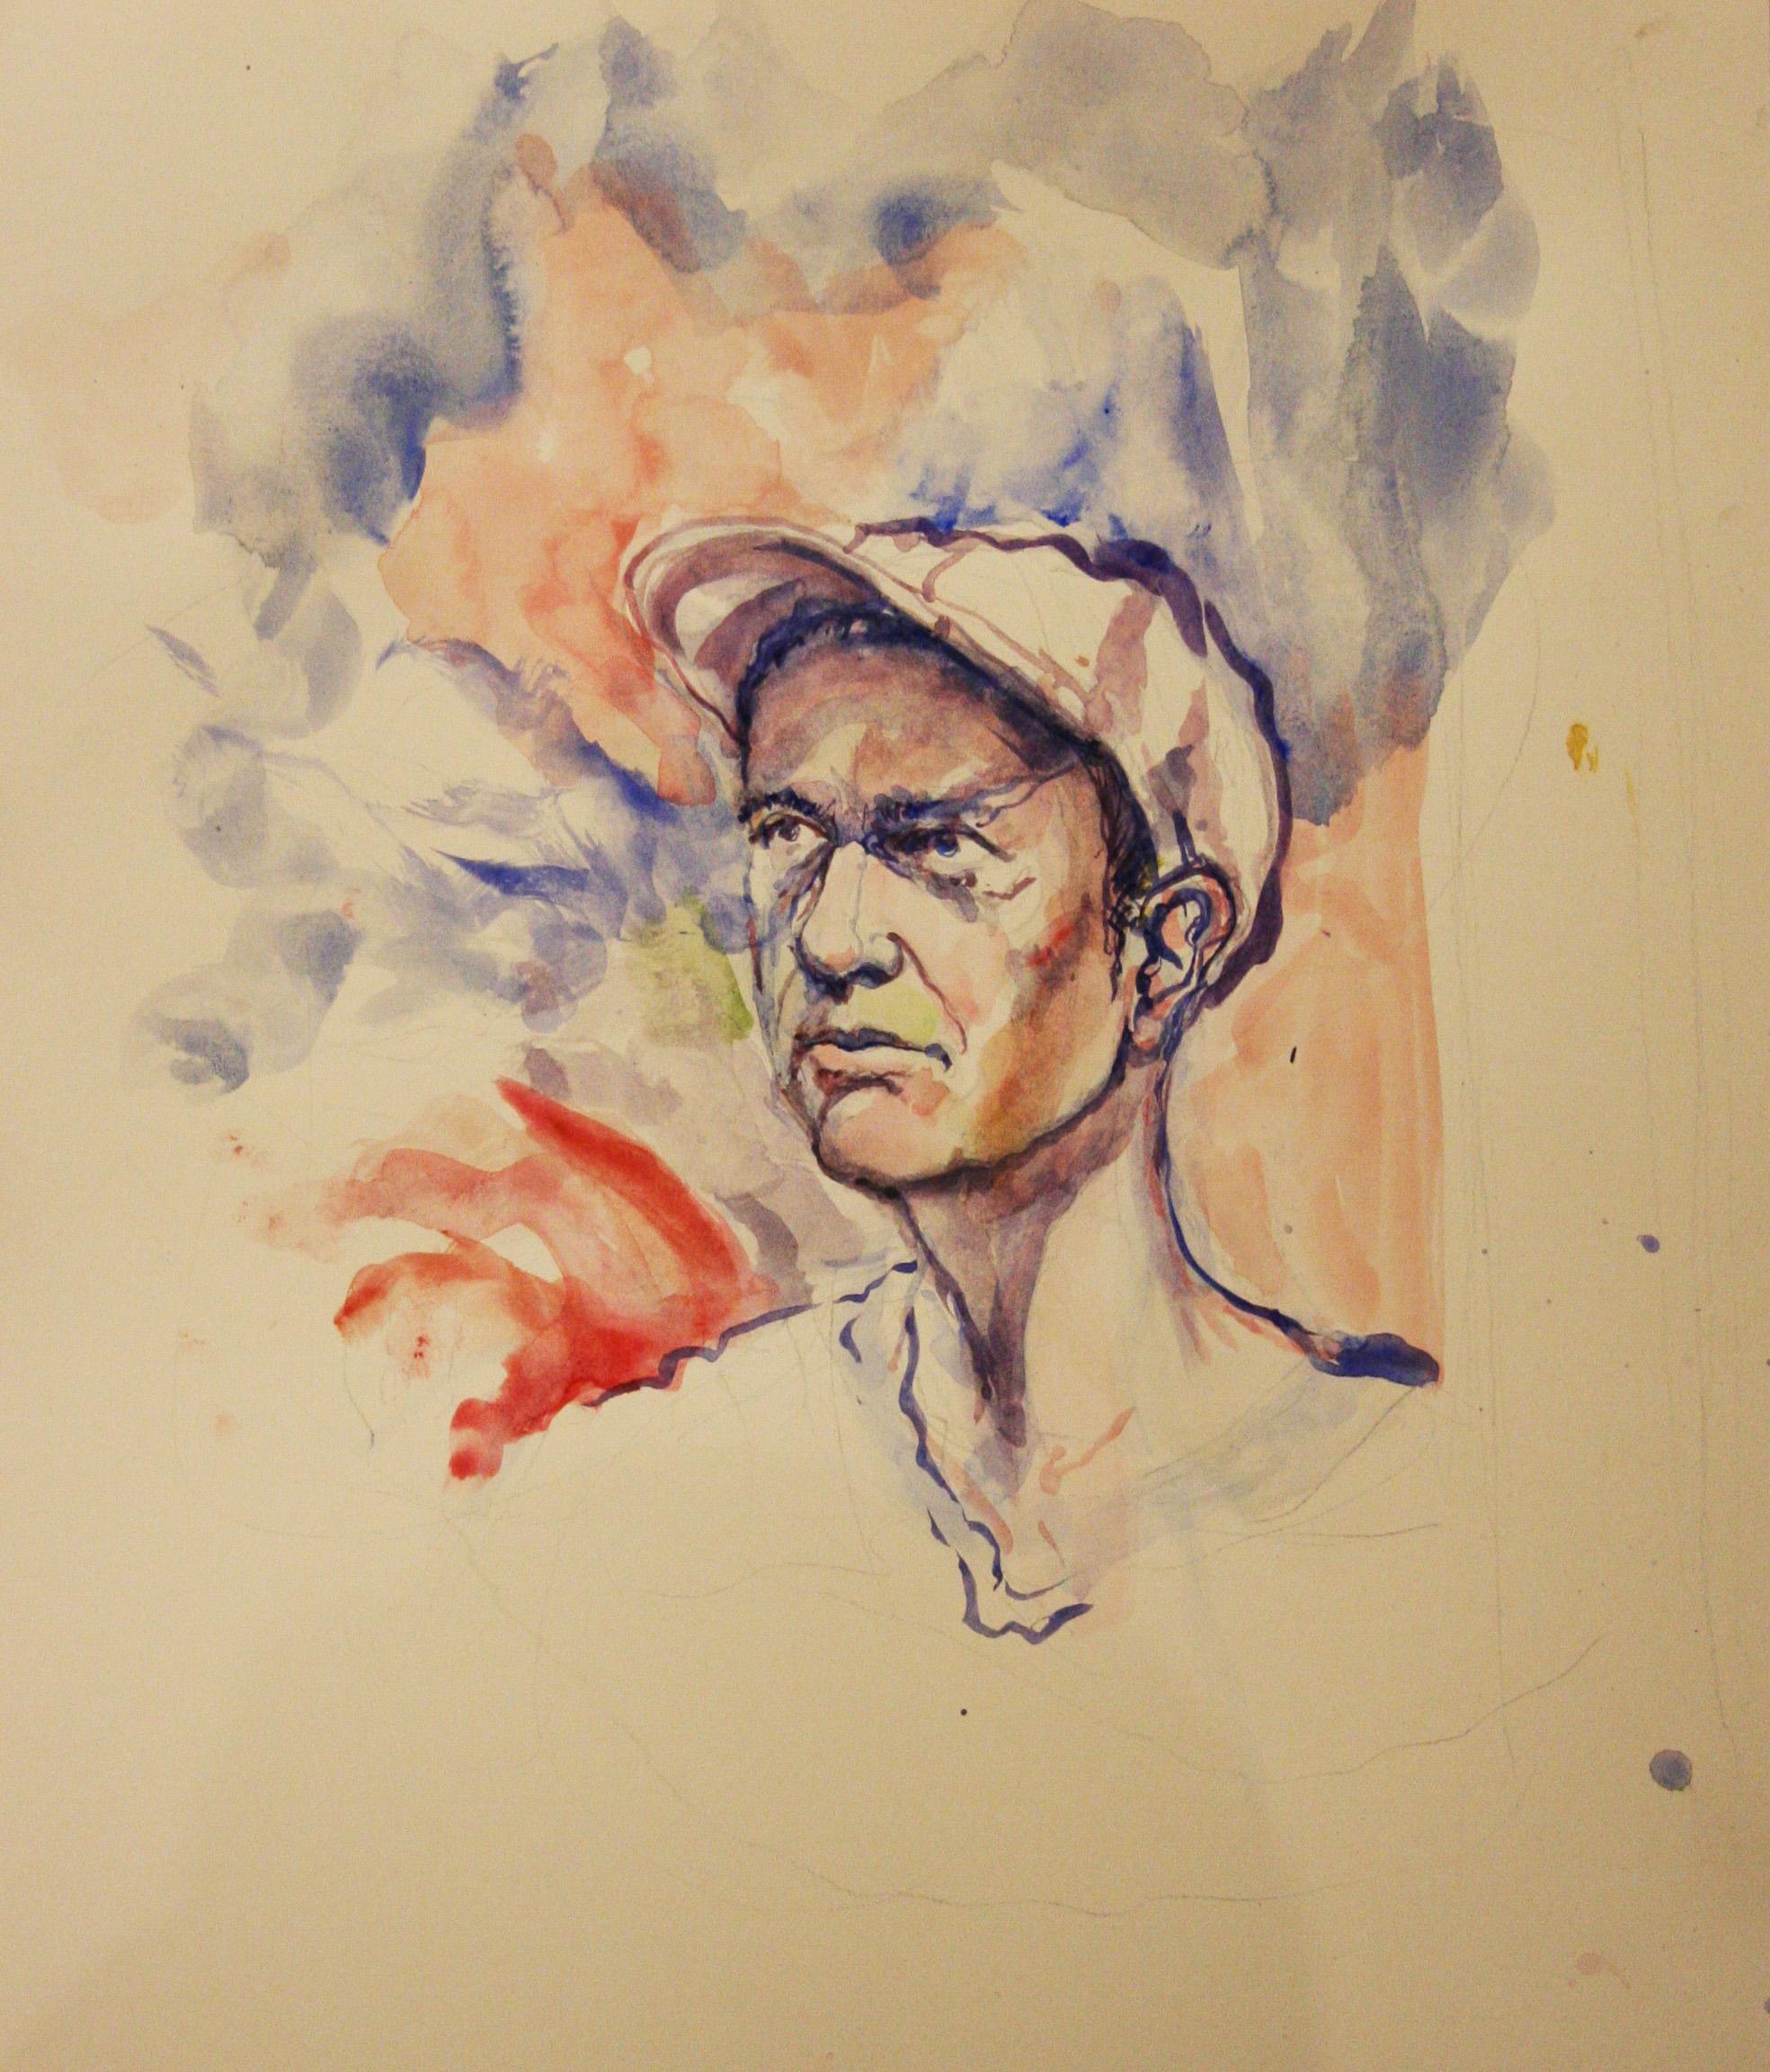 Ryan Oddo did this 3-hour watercolor.